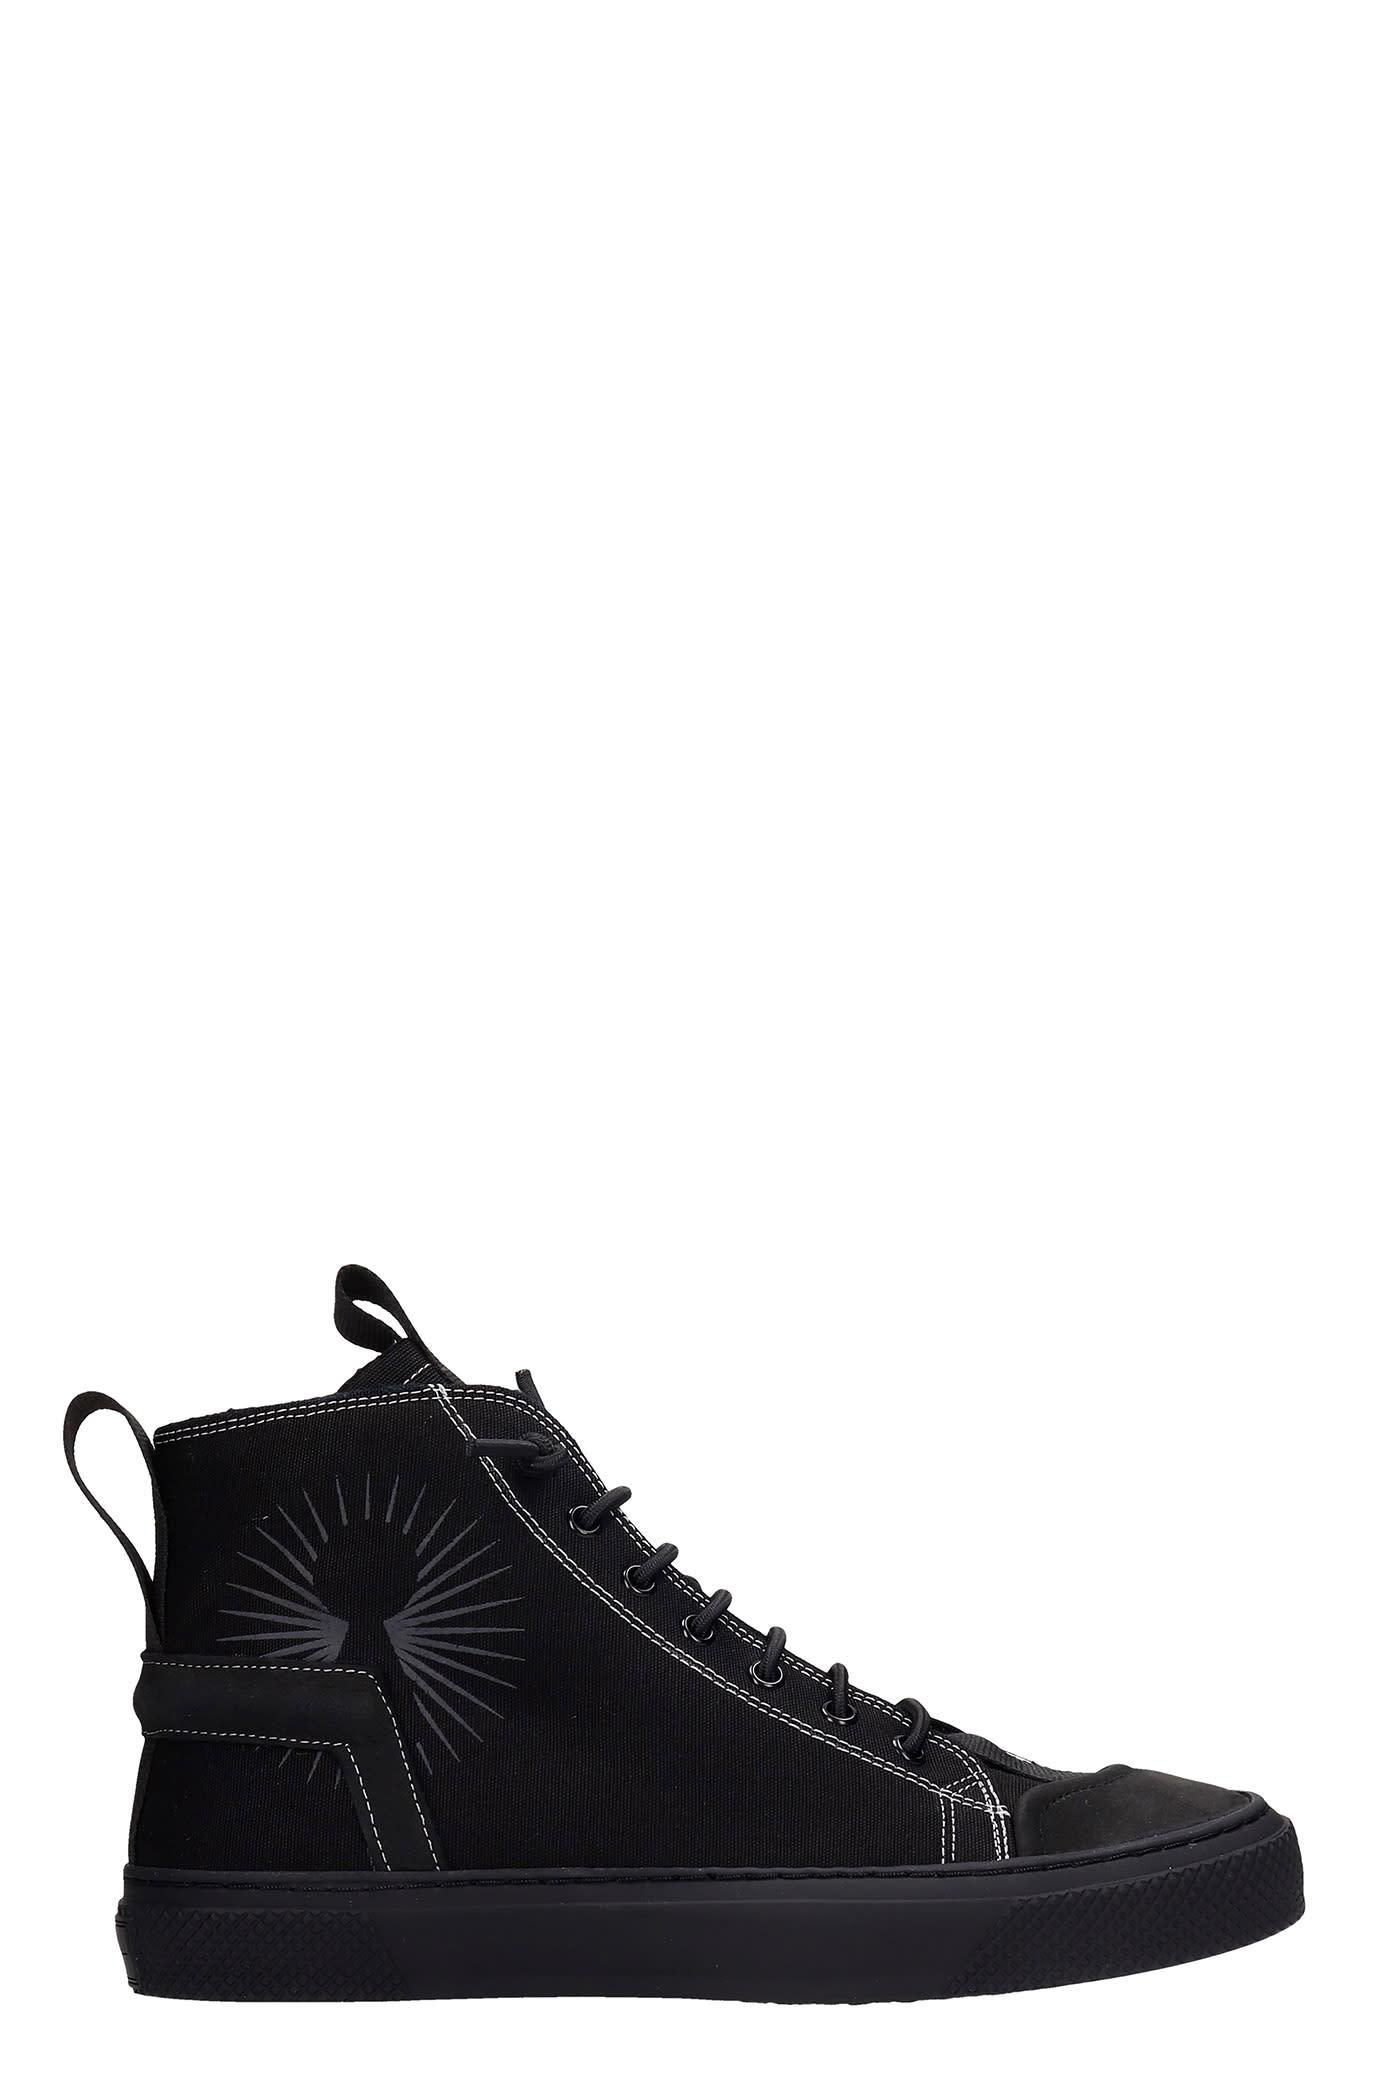 Polon Sneakers In Black Canvas